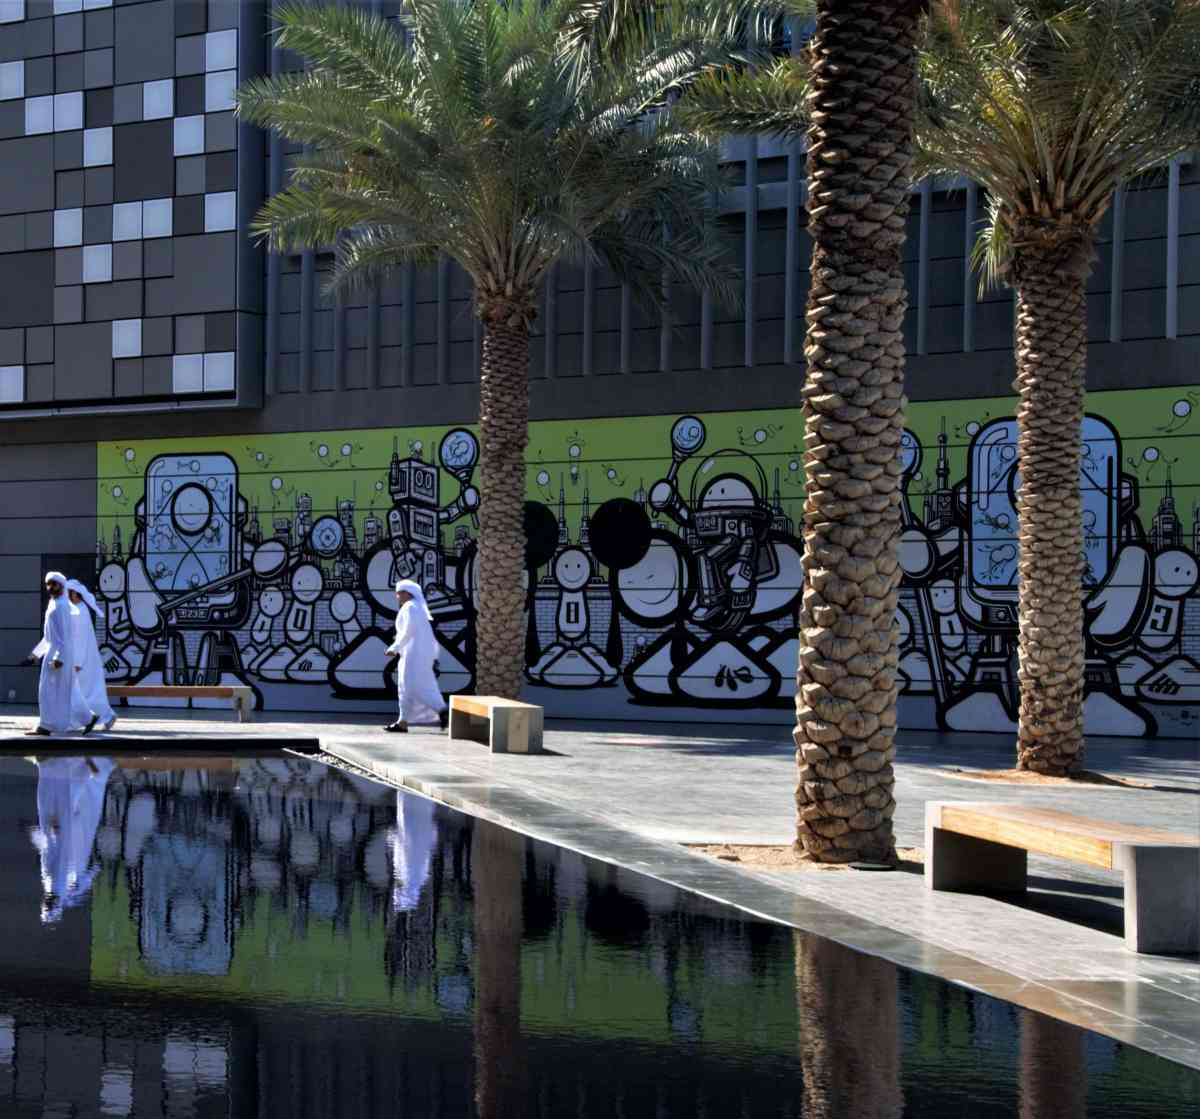 Finding Street Art in Dubai